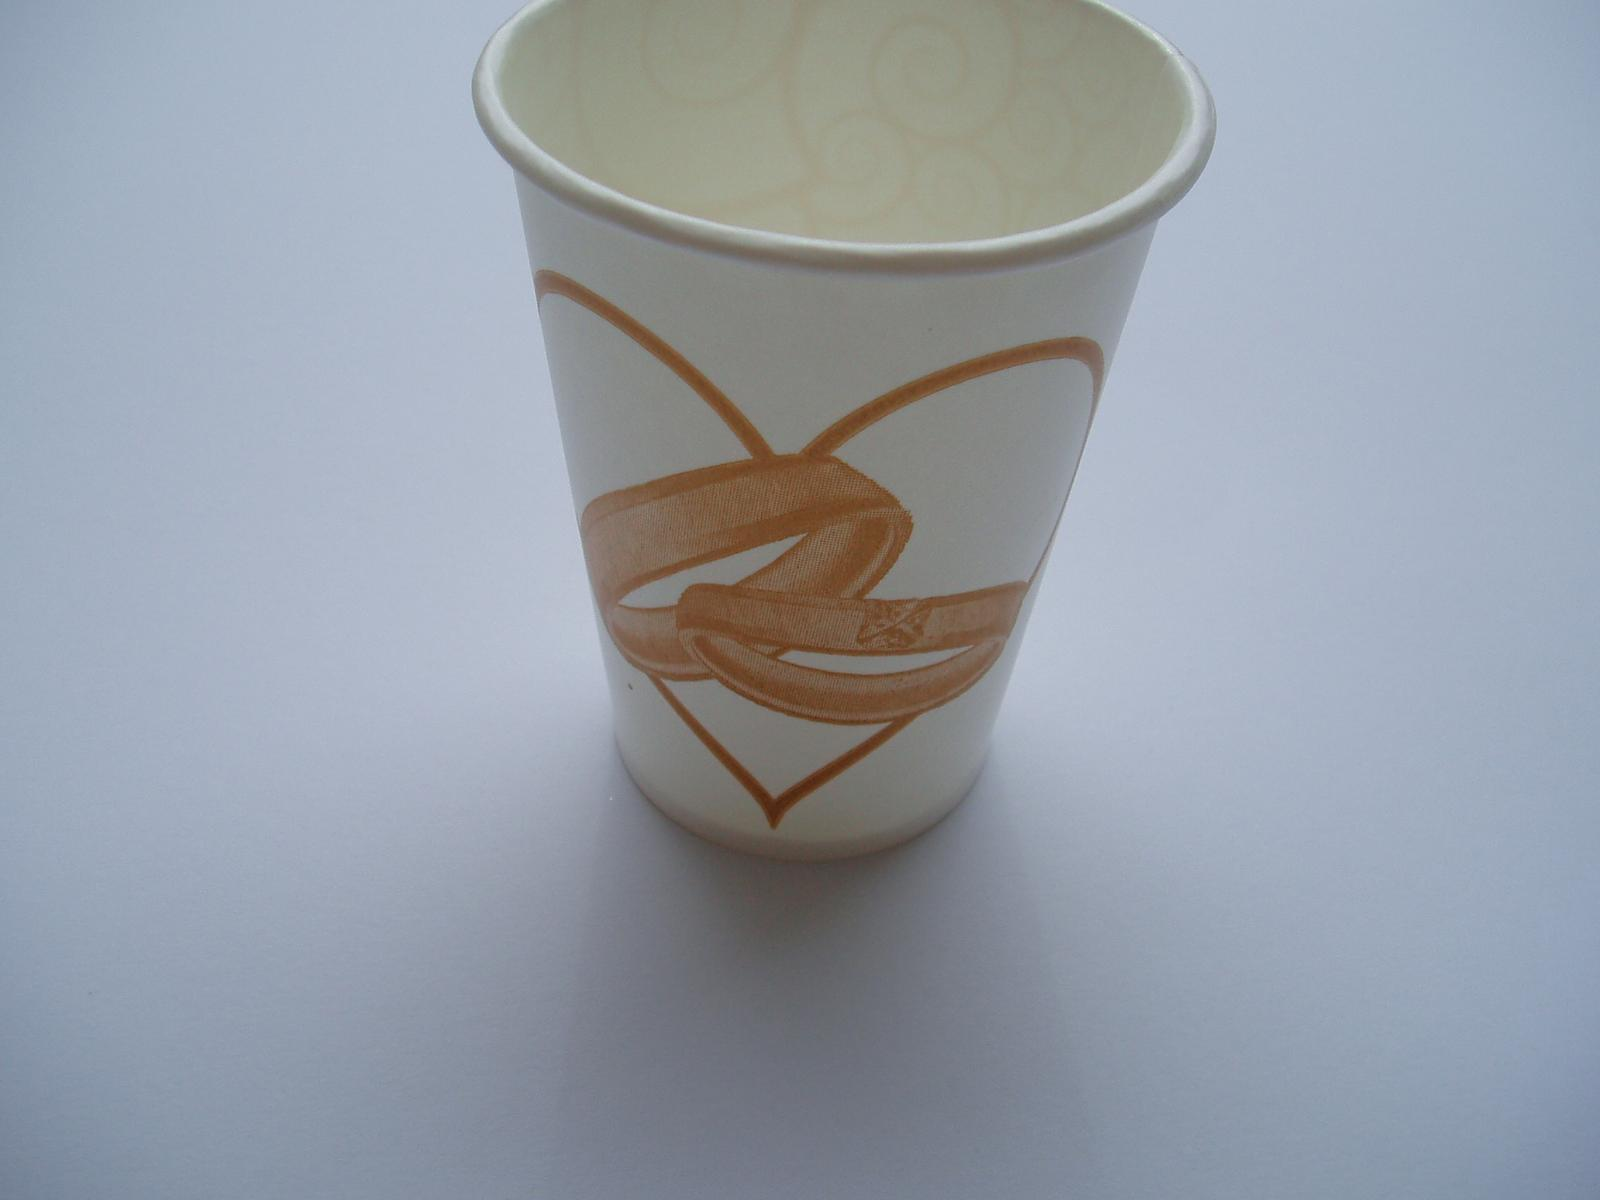 papírový pohárek - Obrázek č. 4